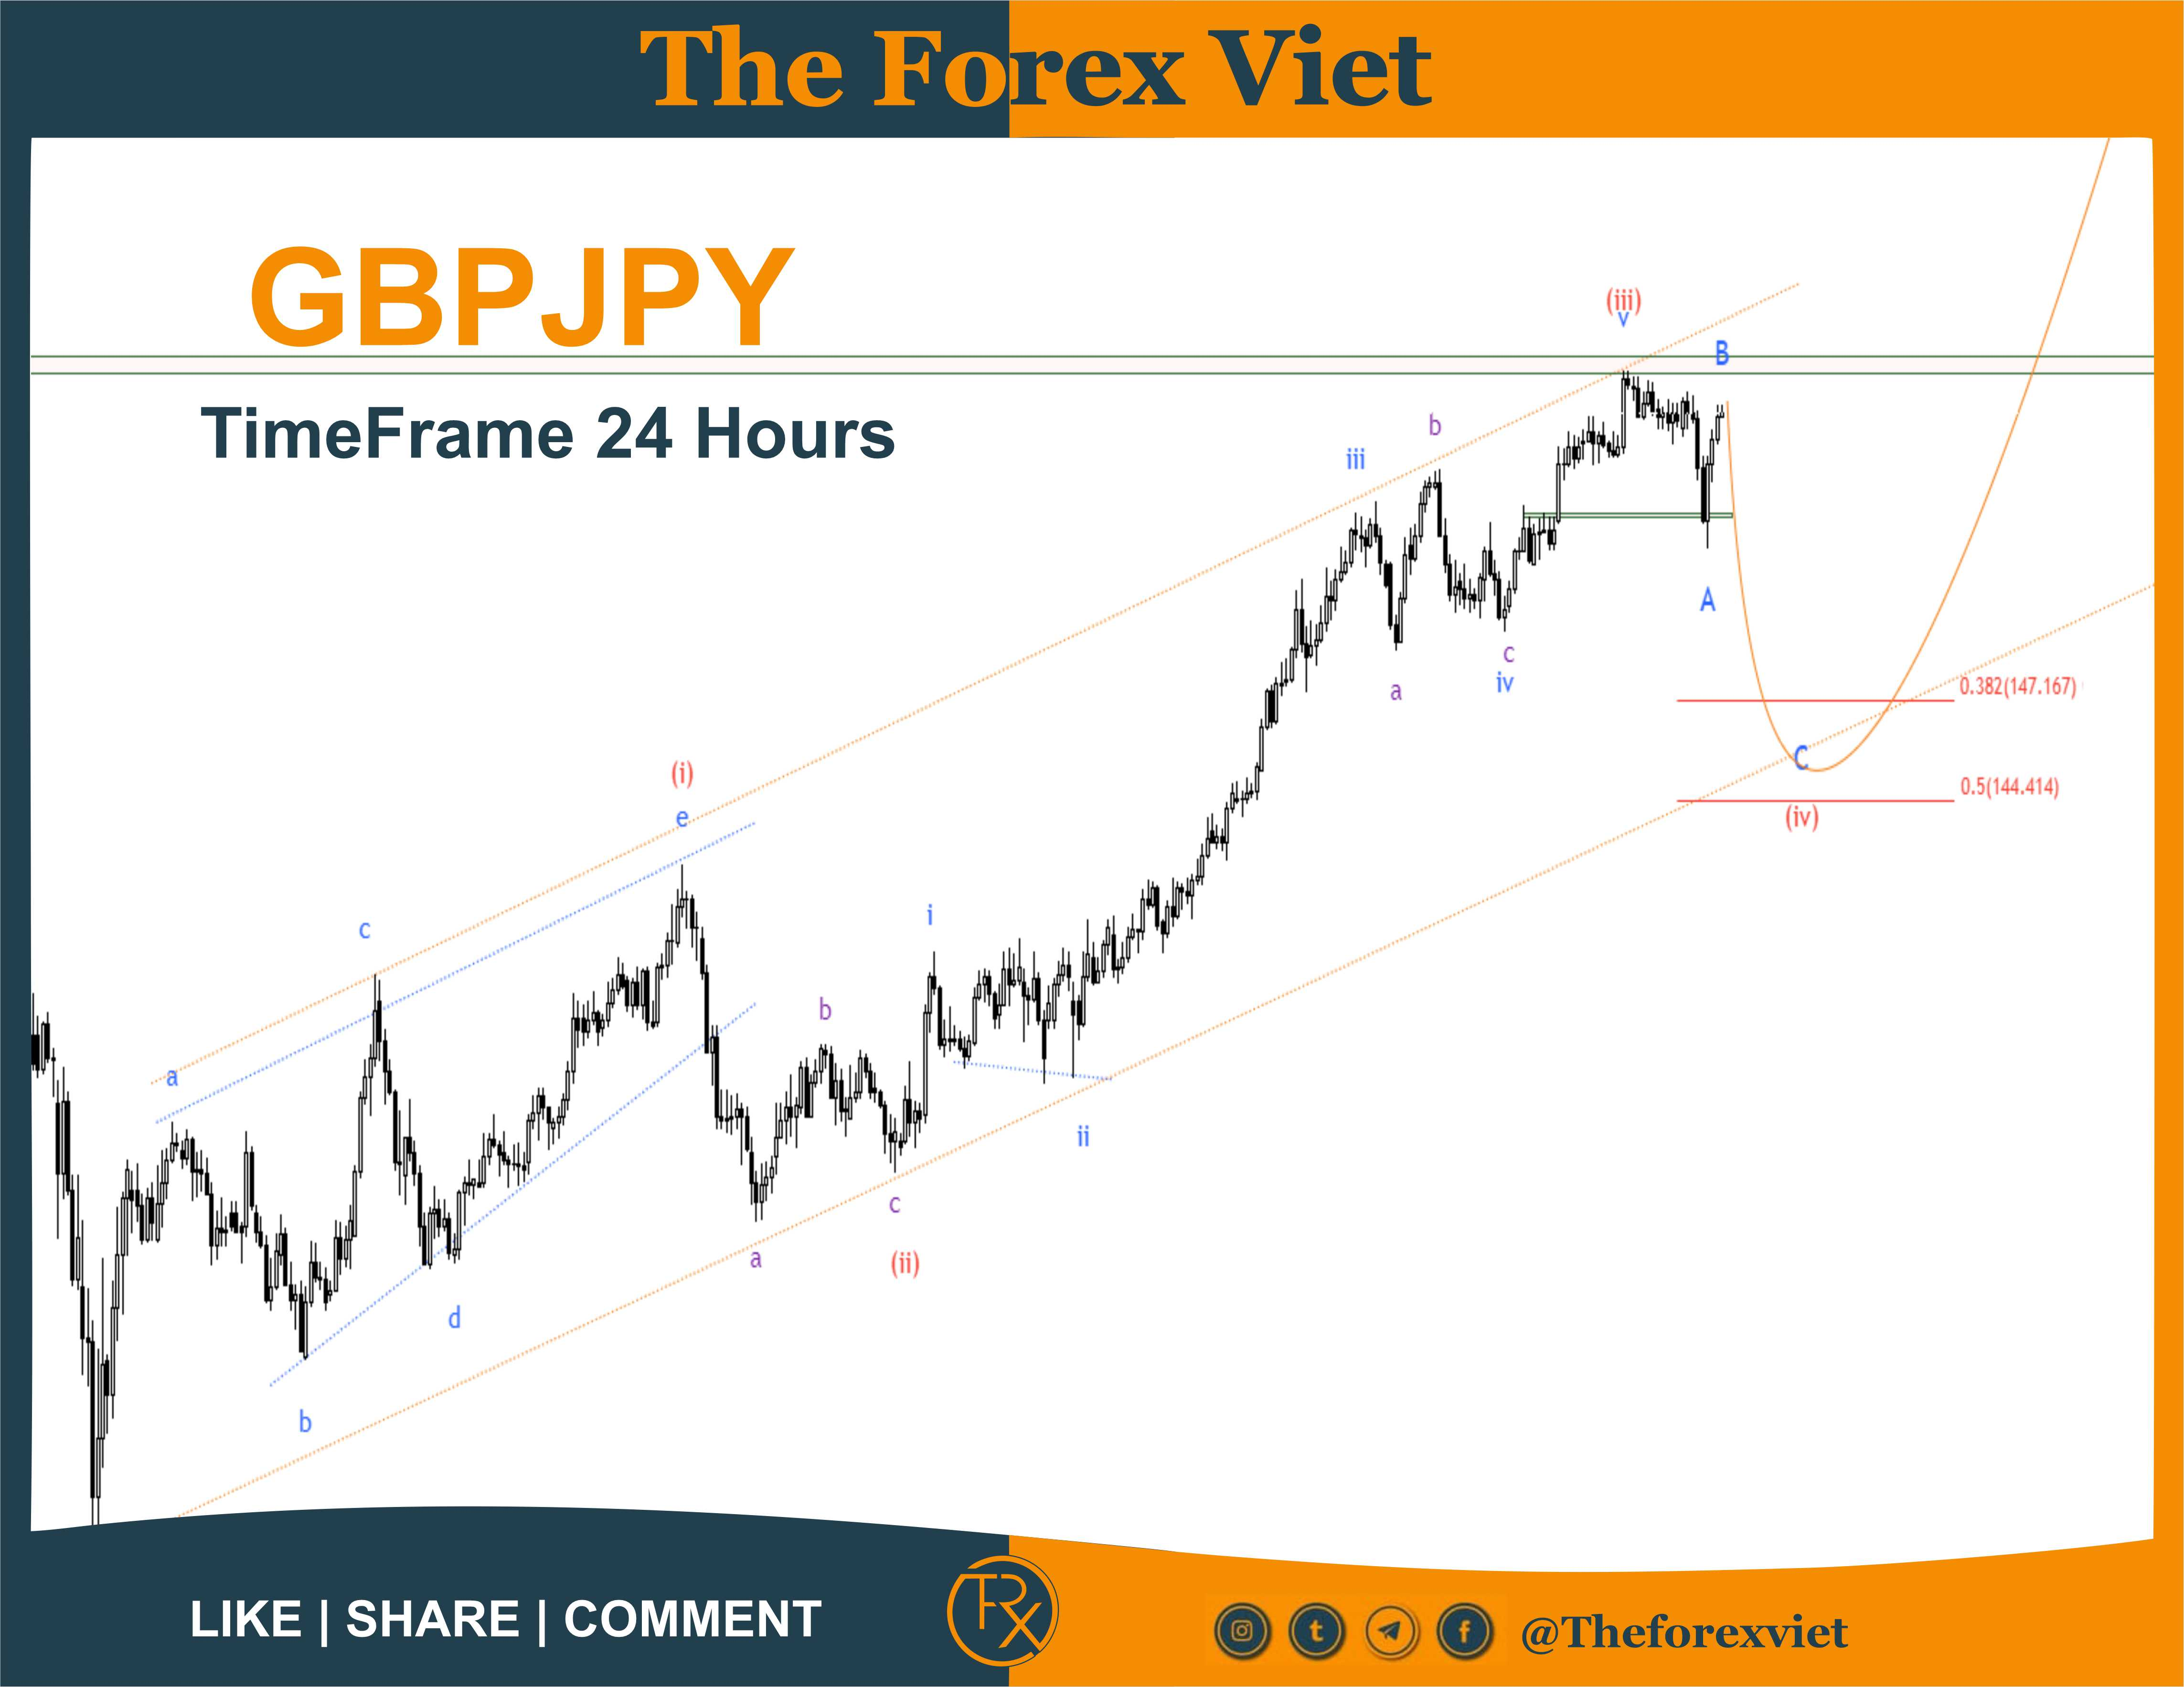 GBPJPY Timeframe 24 hours - 21/06